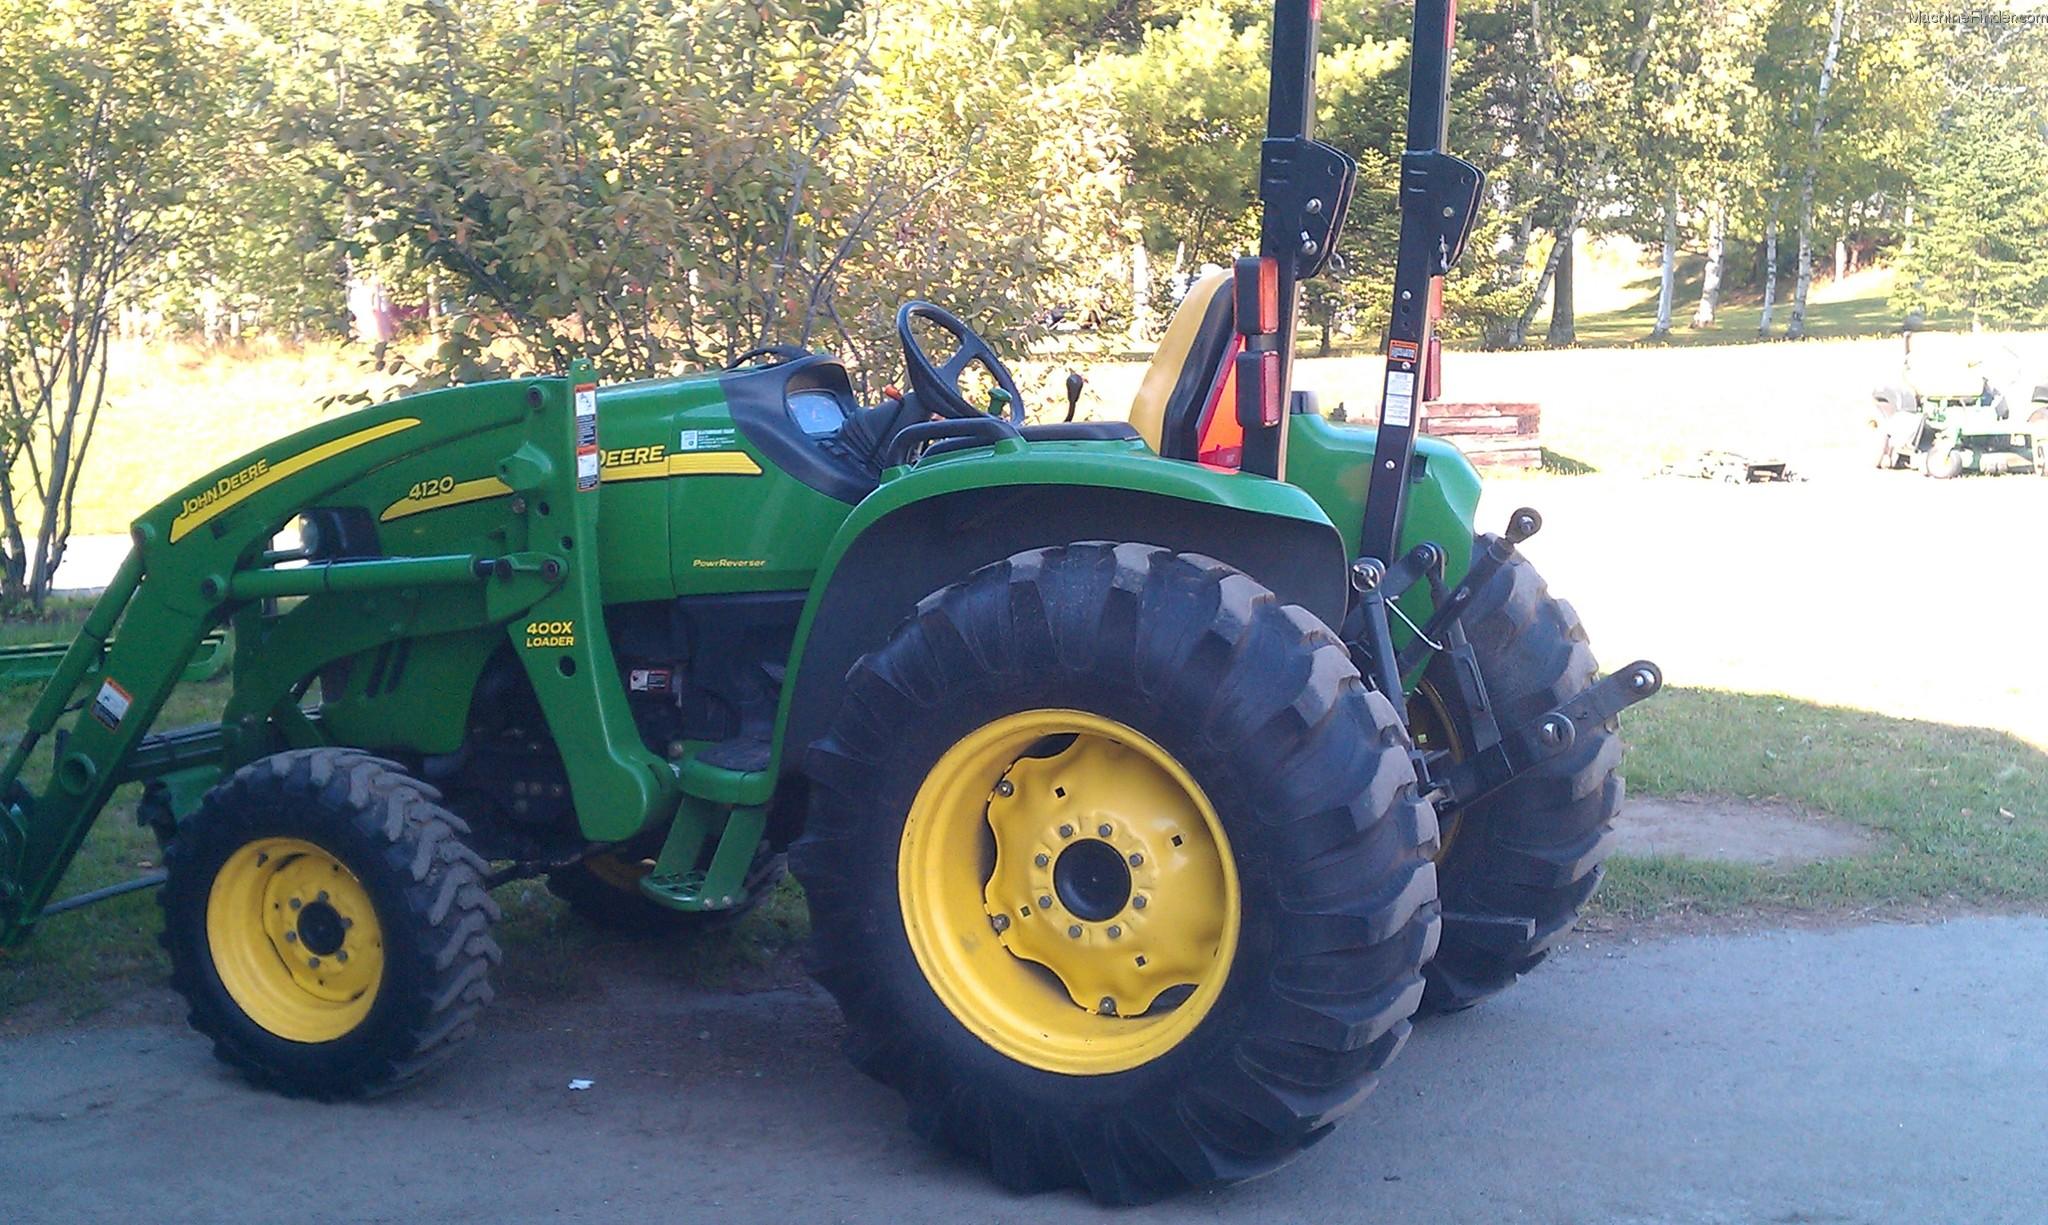 2007 John Deere 4120 Tractors - Compact (1-40hp.) - John ...